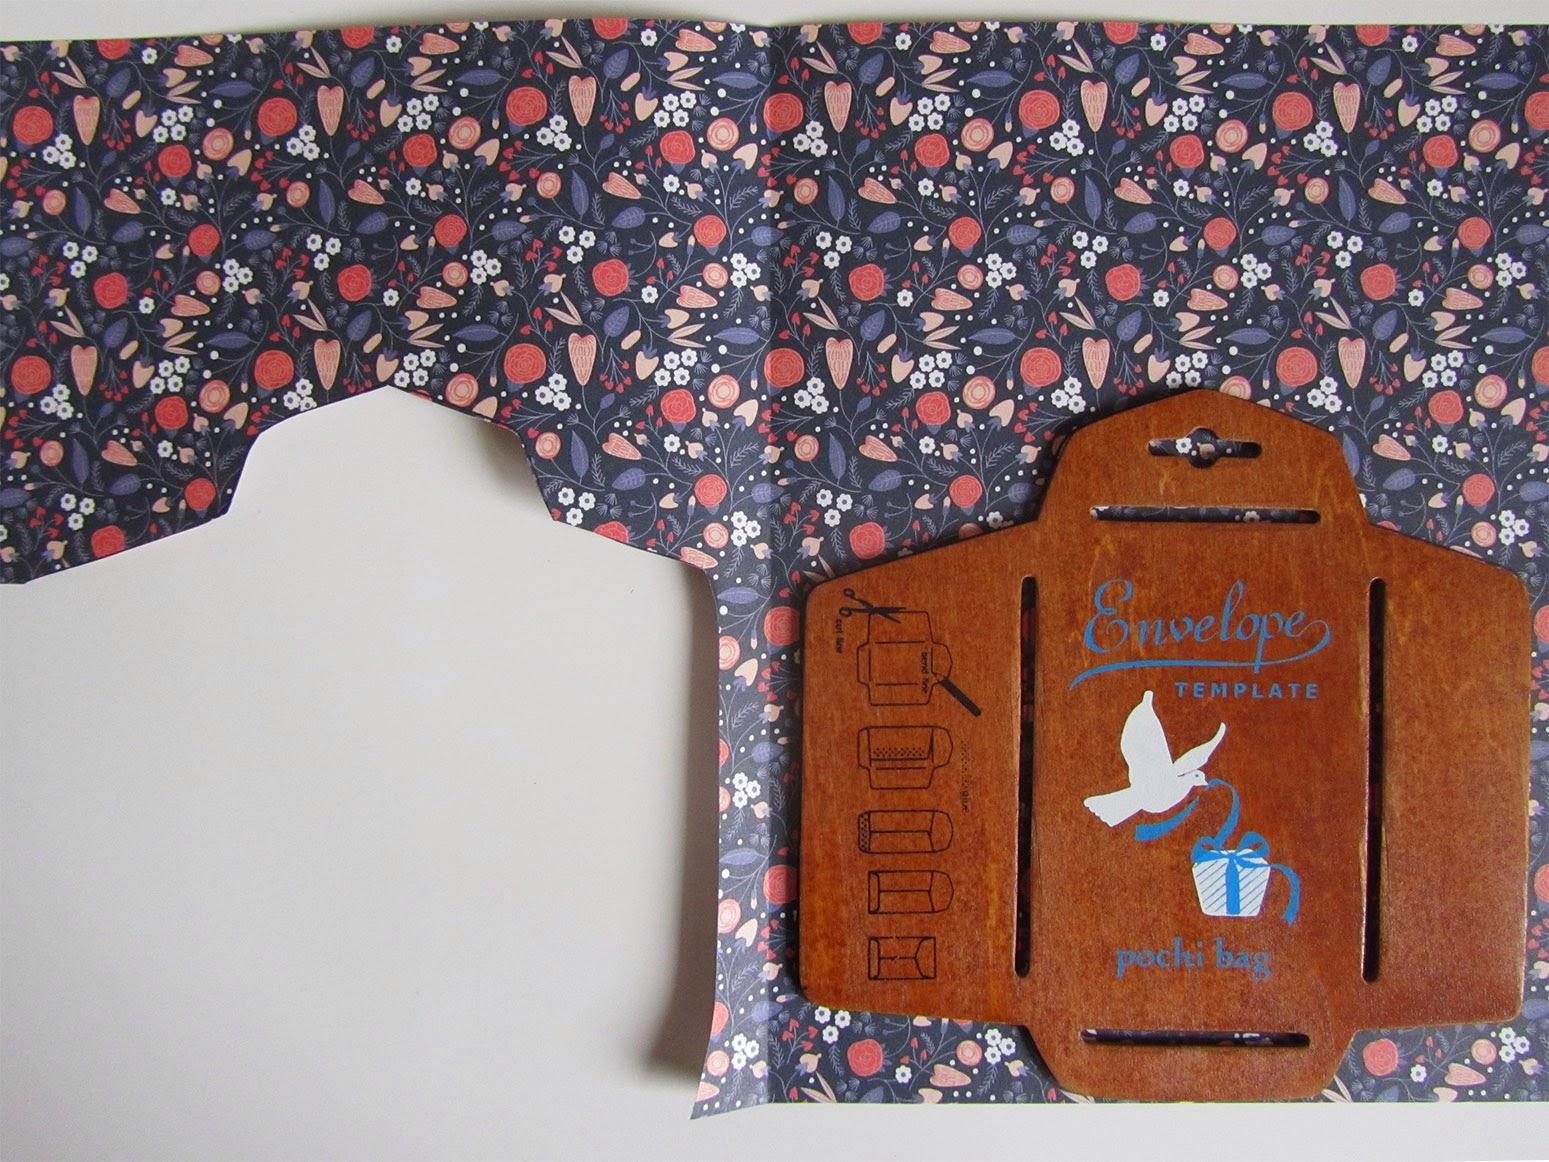 little wooden envelope template